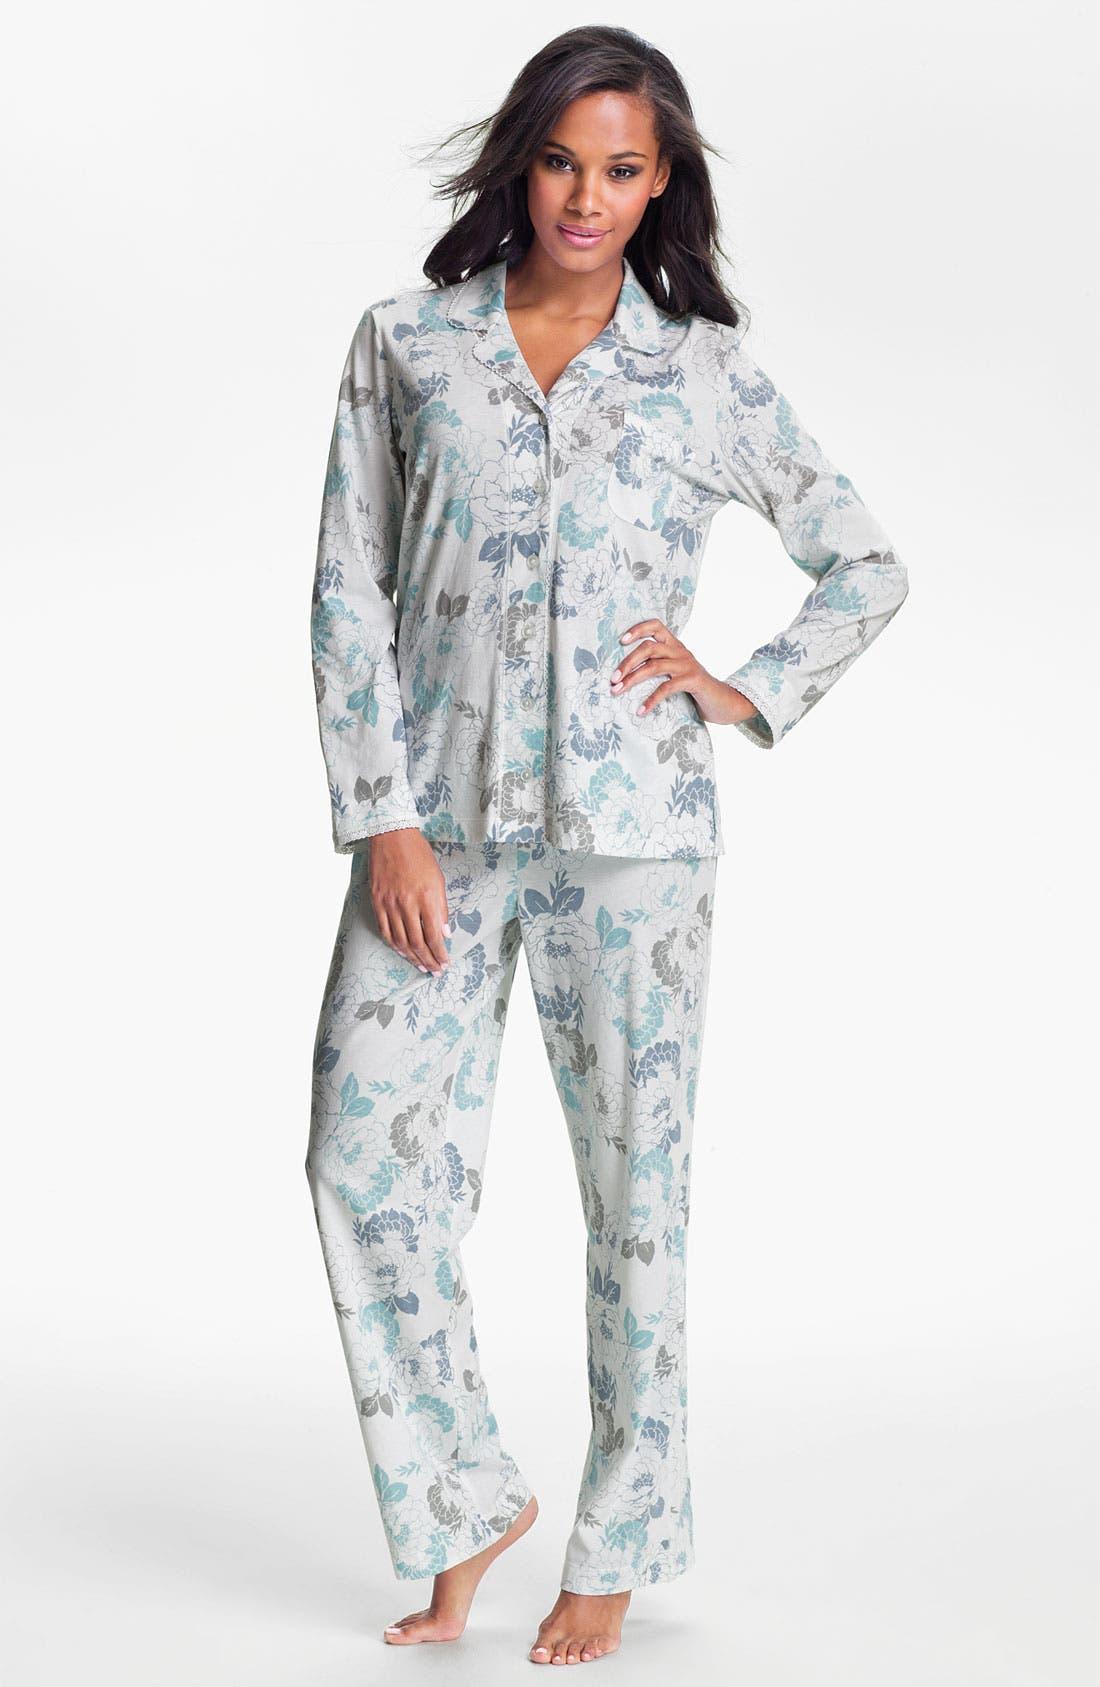 Main Image - Carole Hochman Designs 'Airbrushed Floral' Pajamas